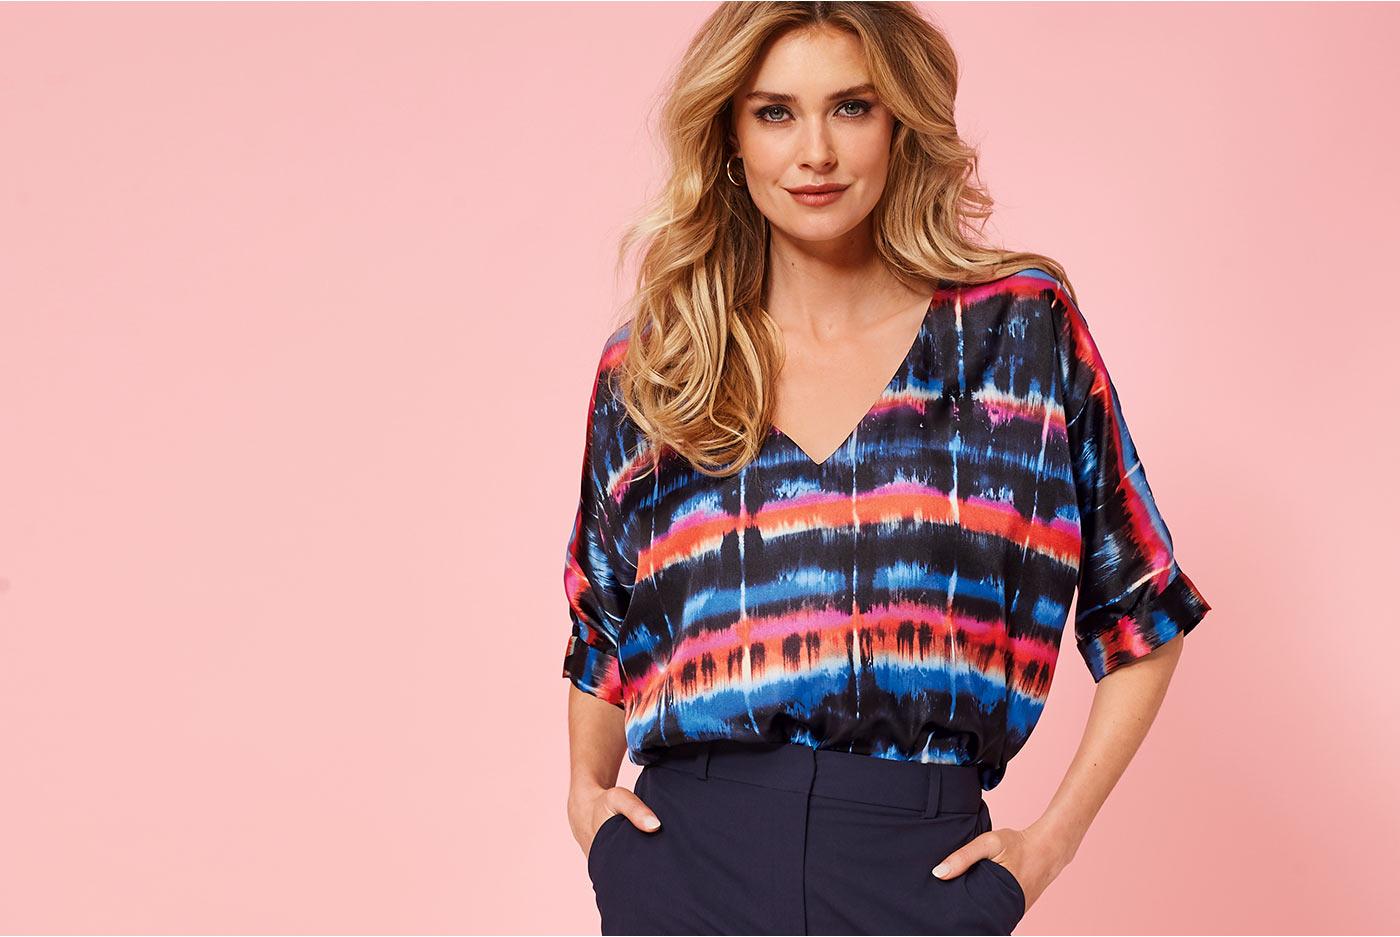 b45a169bb3 Latest Ladies' Fashion | Women's Clothing | Kaleidoscope